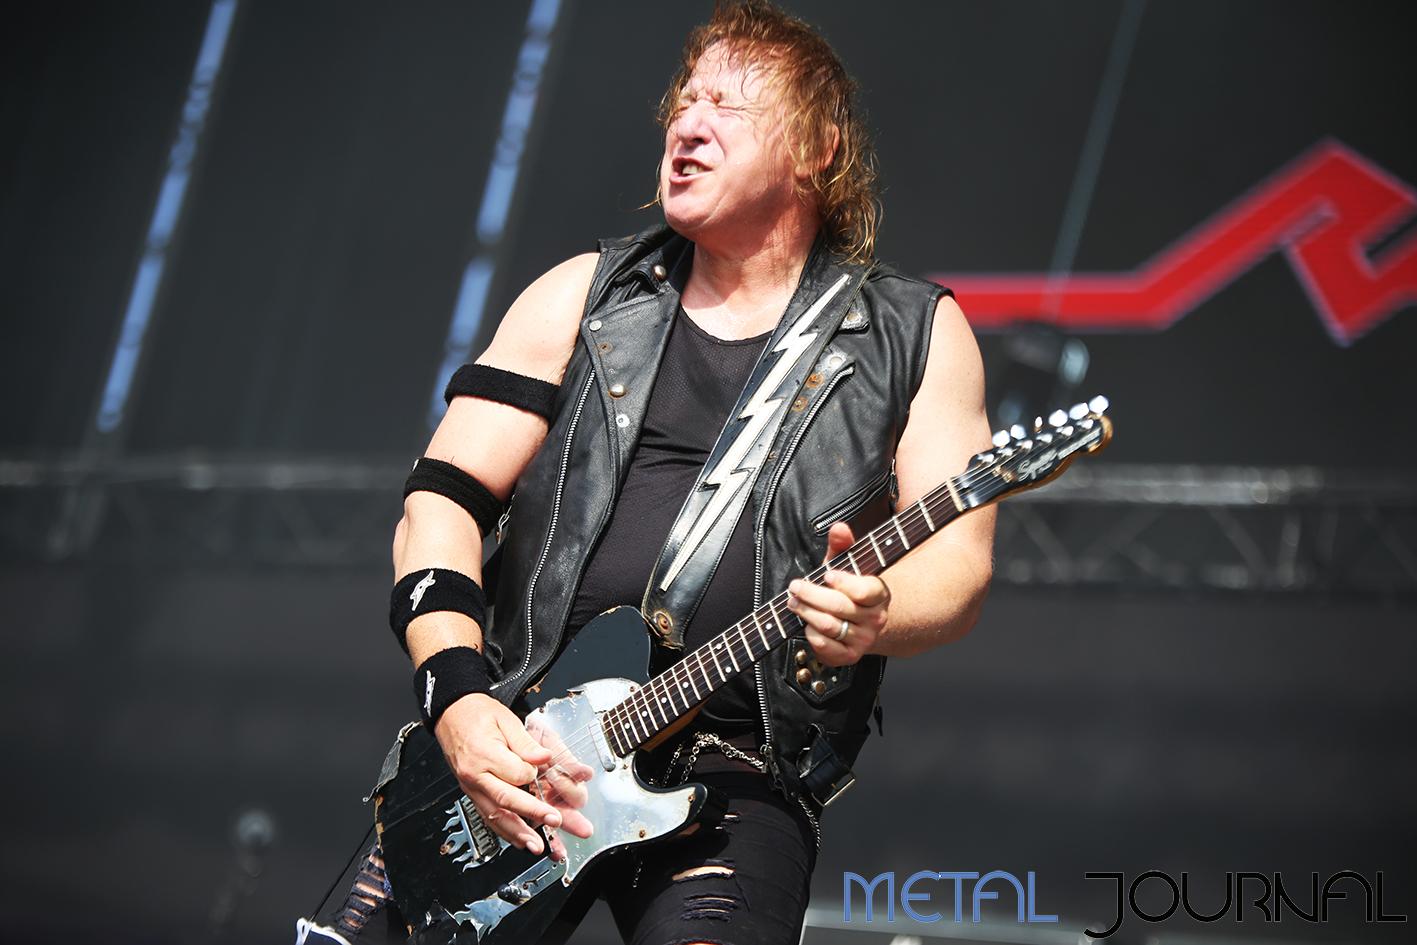 raven - metal journal rock fest barcelona 2019 pic 7